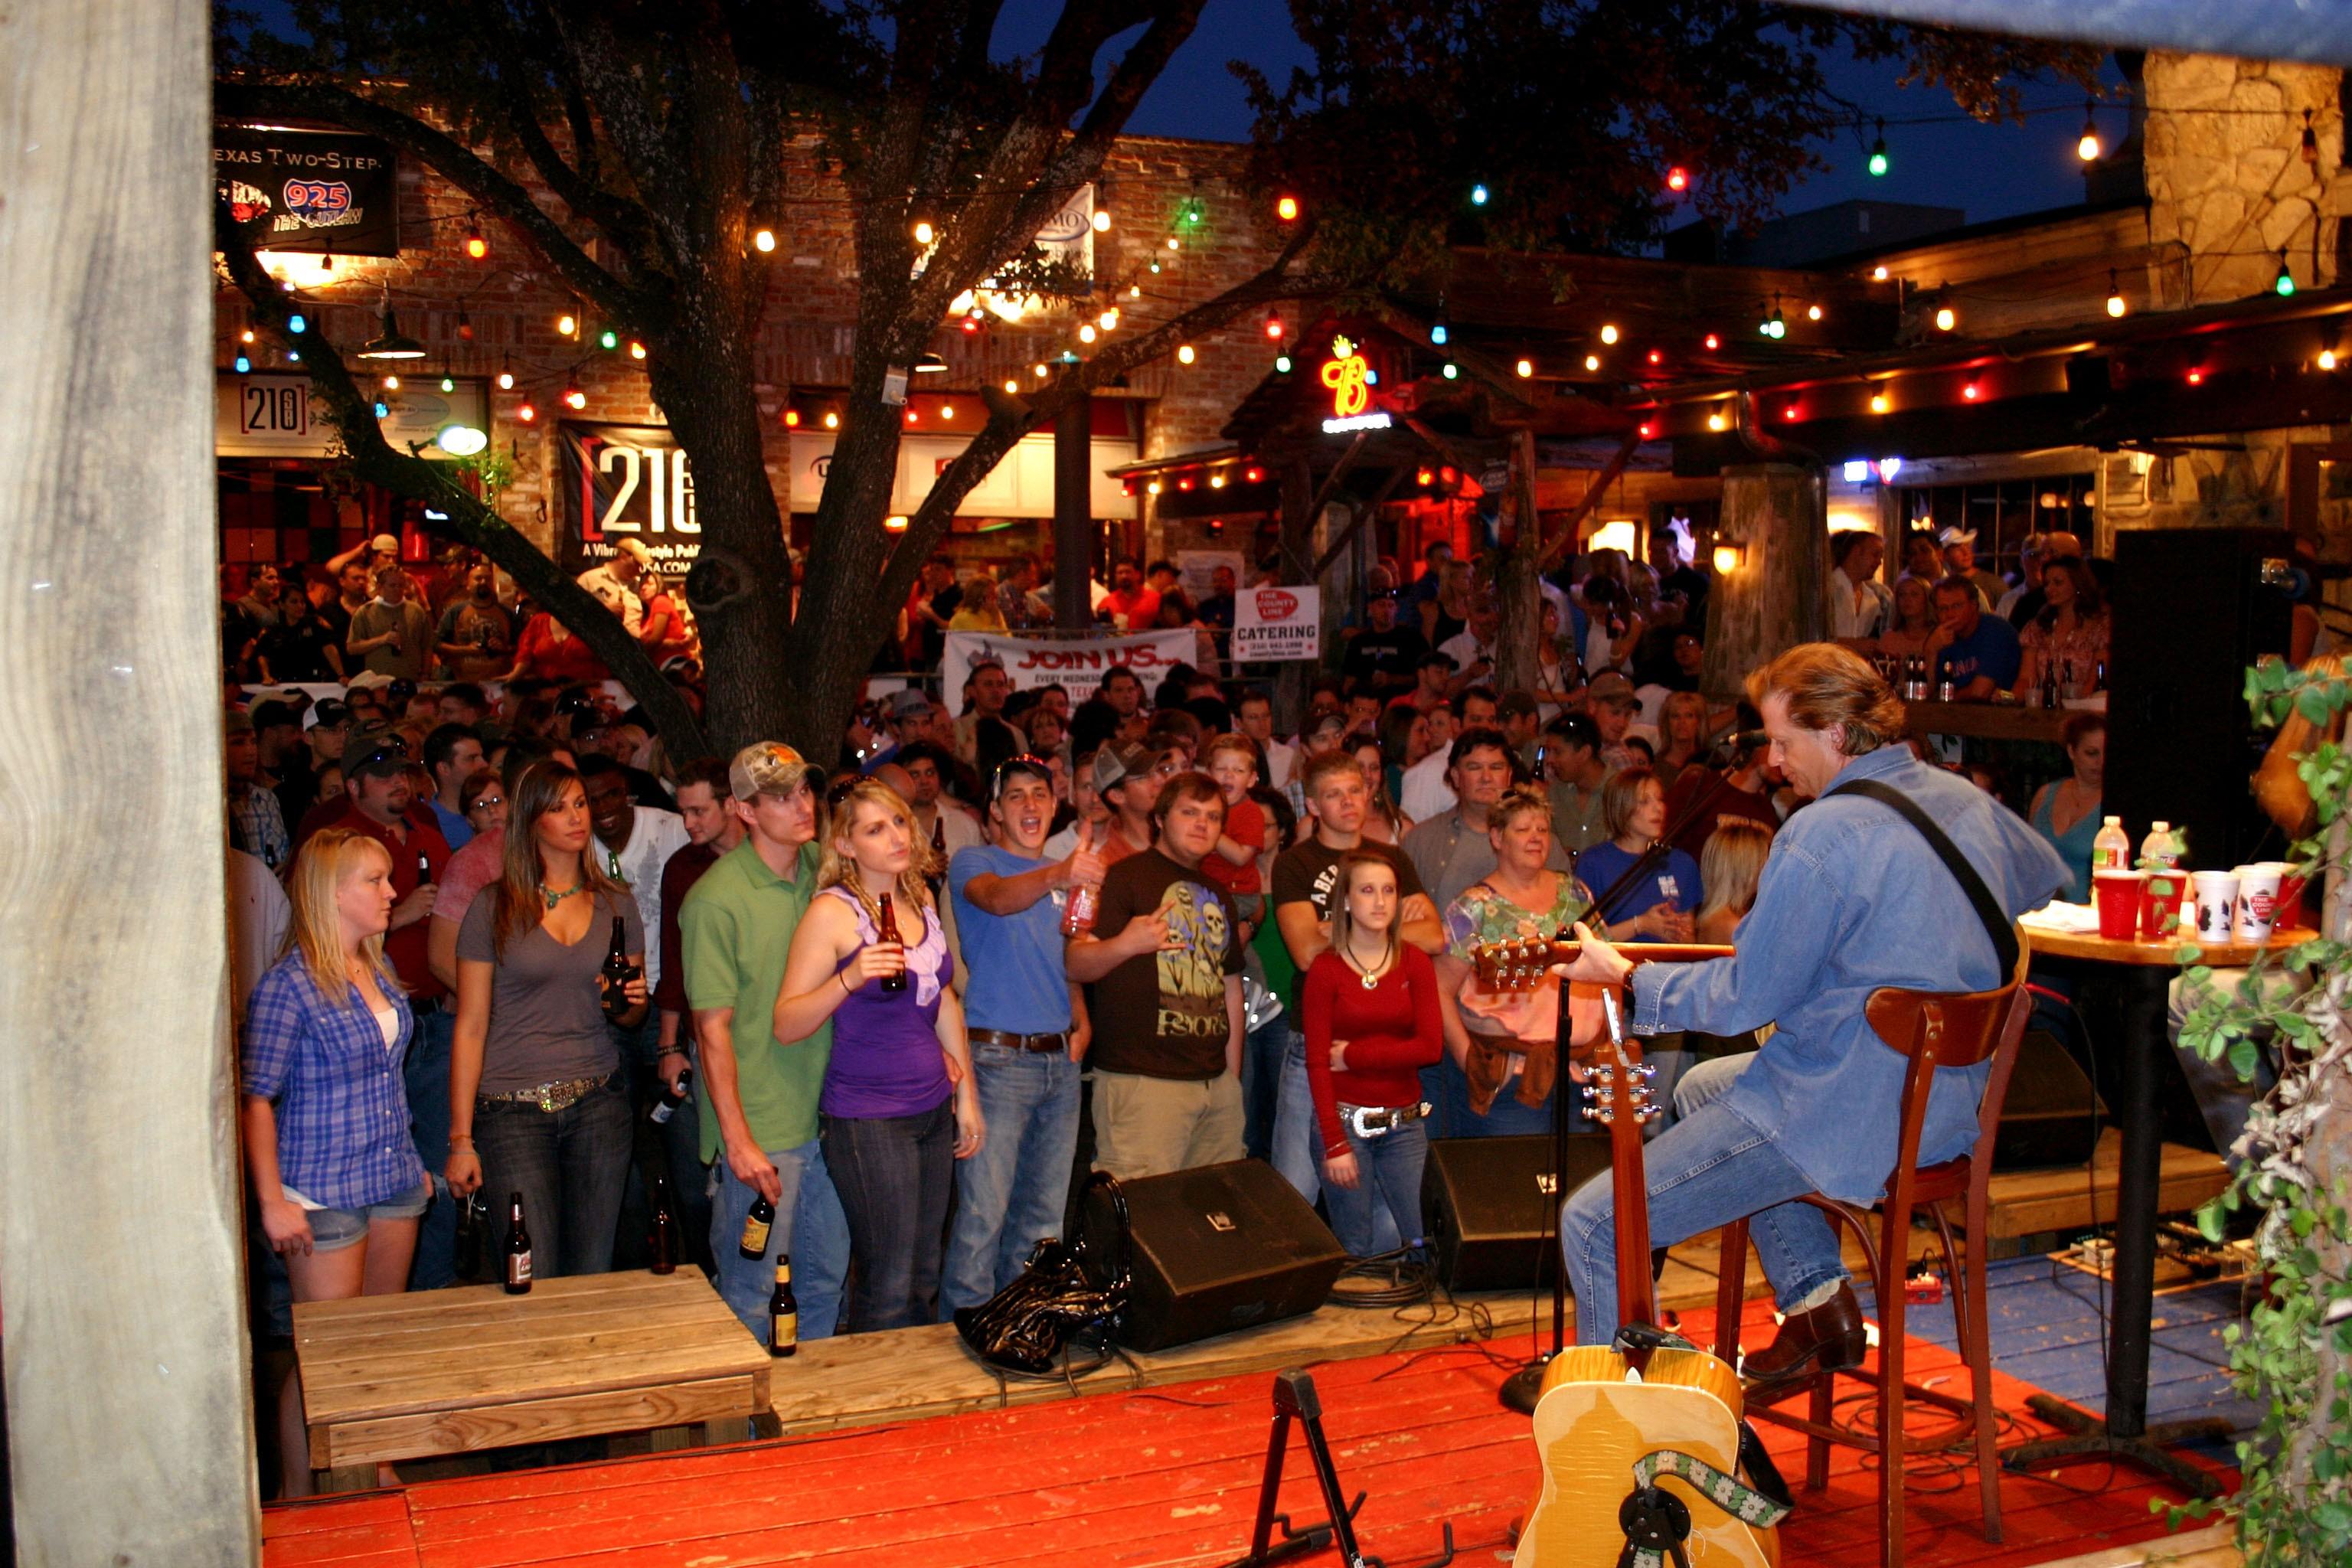 Thirsty Horse Saloon San Antonio Halloween 2020 The County Line Free Concert Series | SA Sound